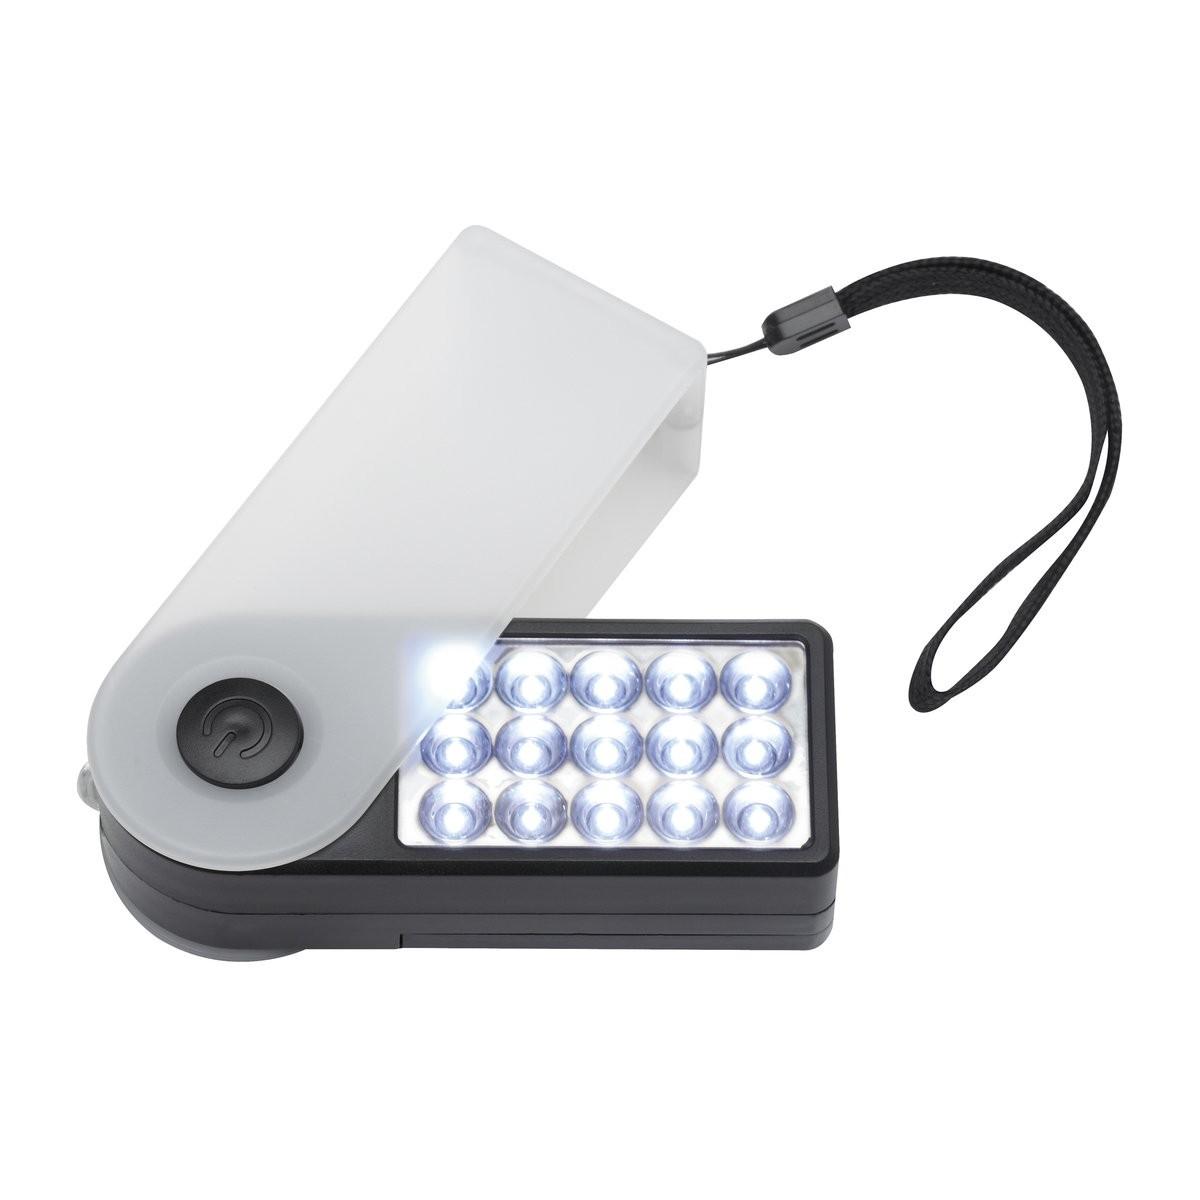 LED Taschenlampe REFLECTS-KEMI WHITE, Ansicht 7